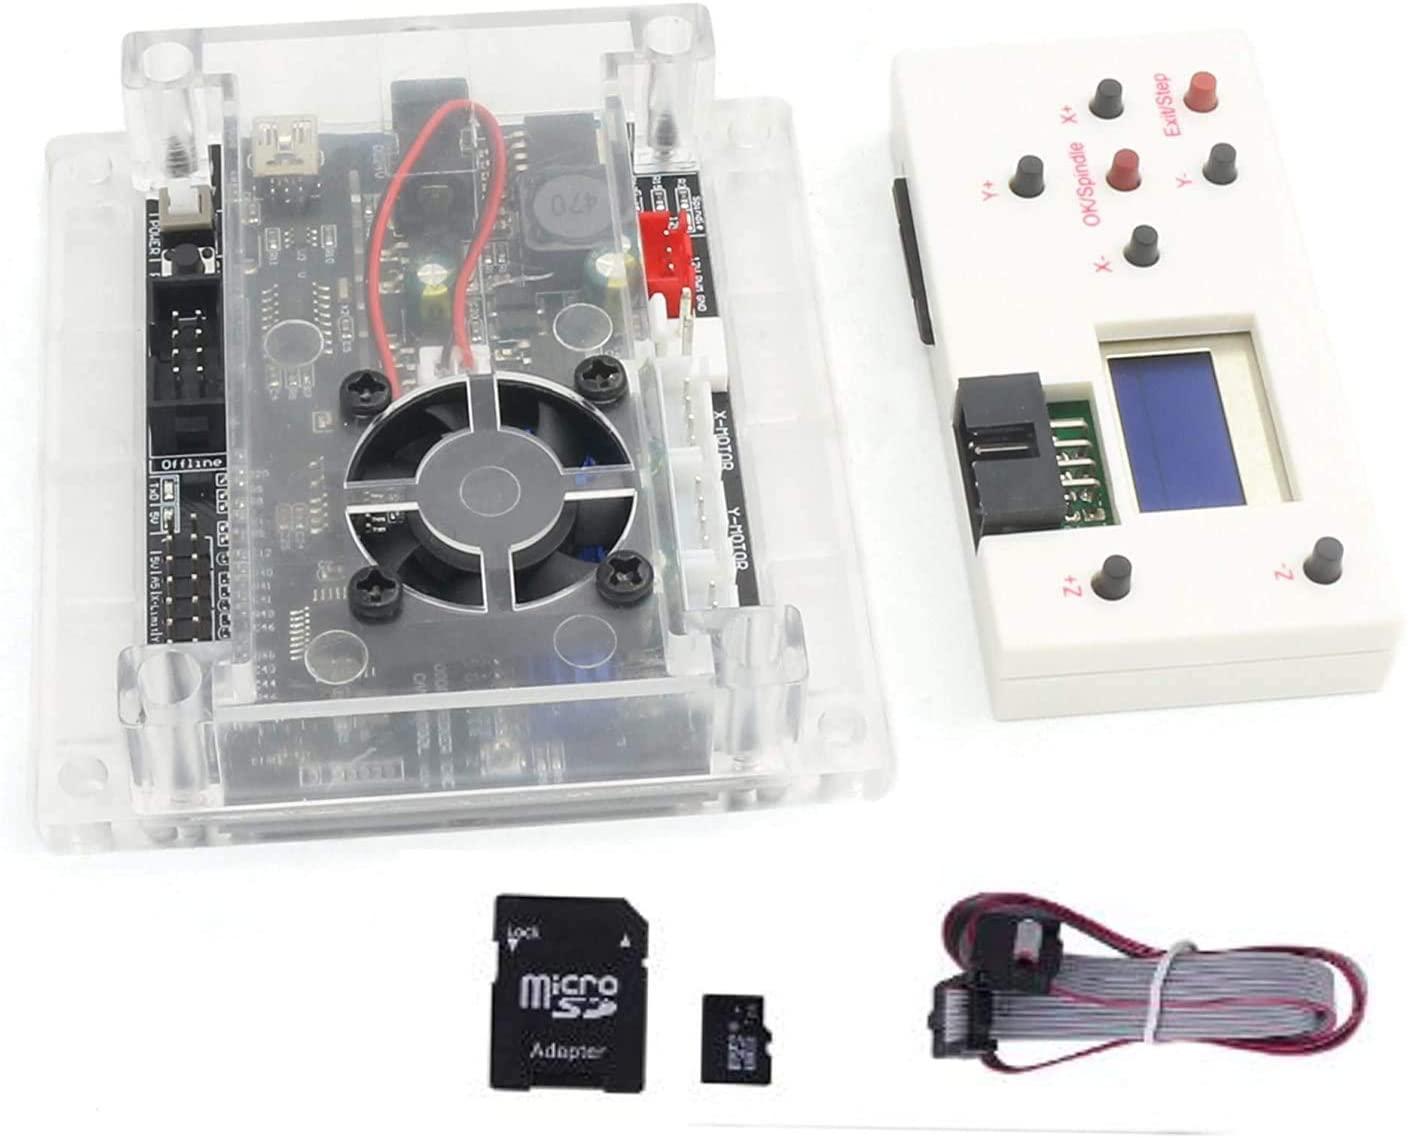 RATTM Motor 3 Axis 1.1f GRBL Control Board